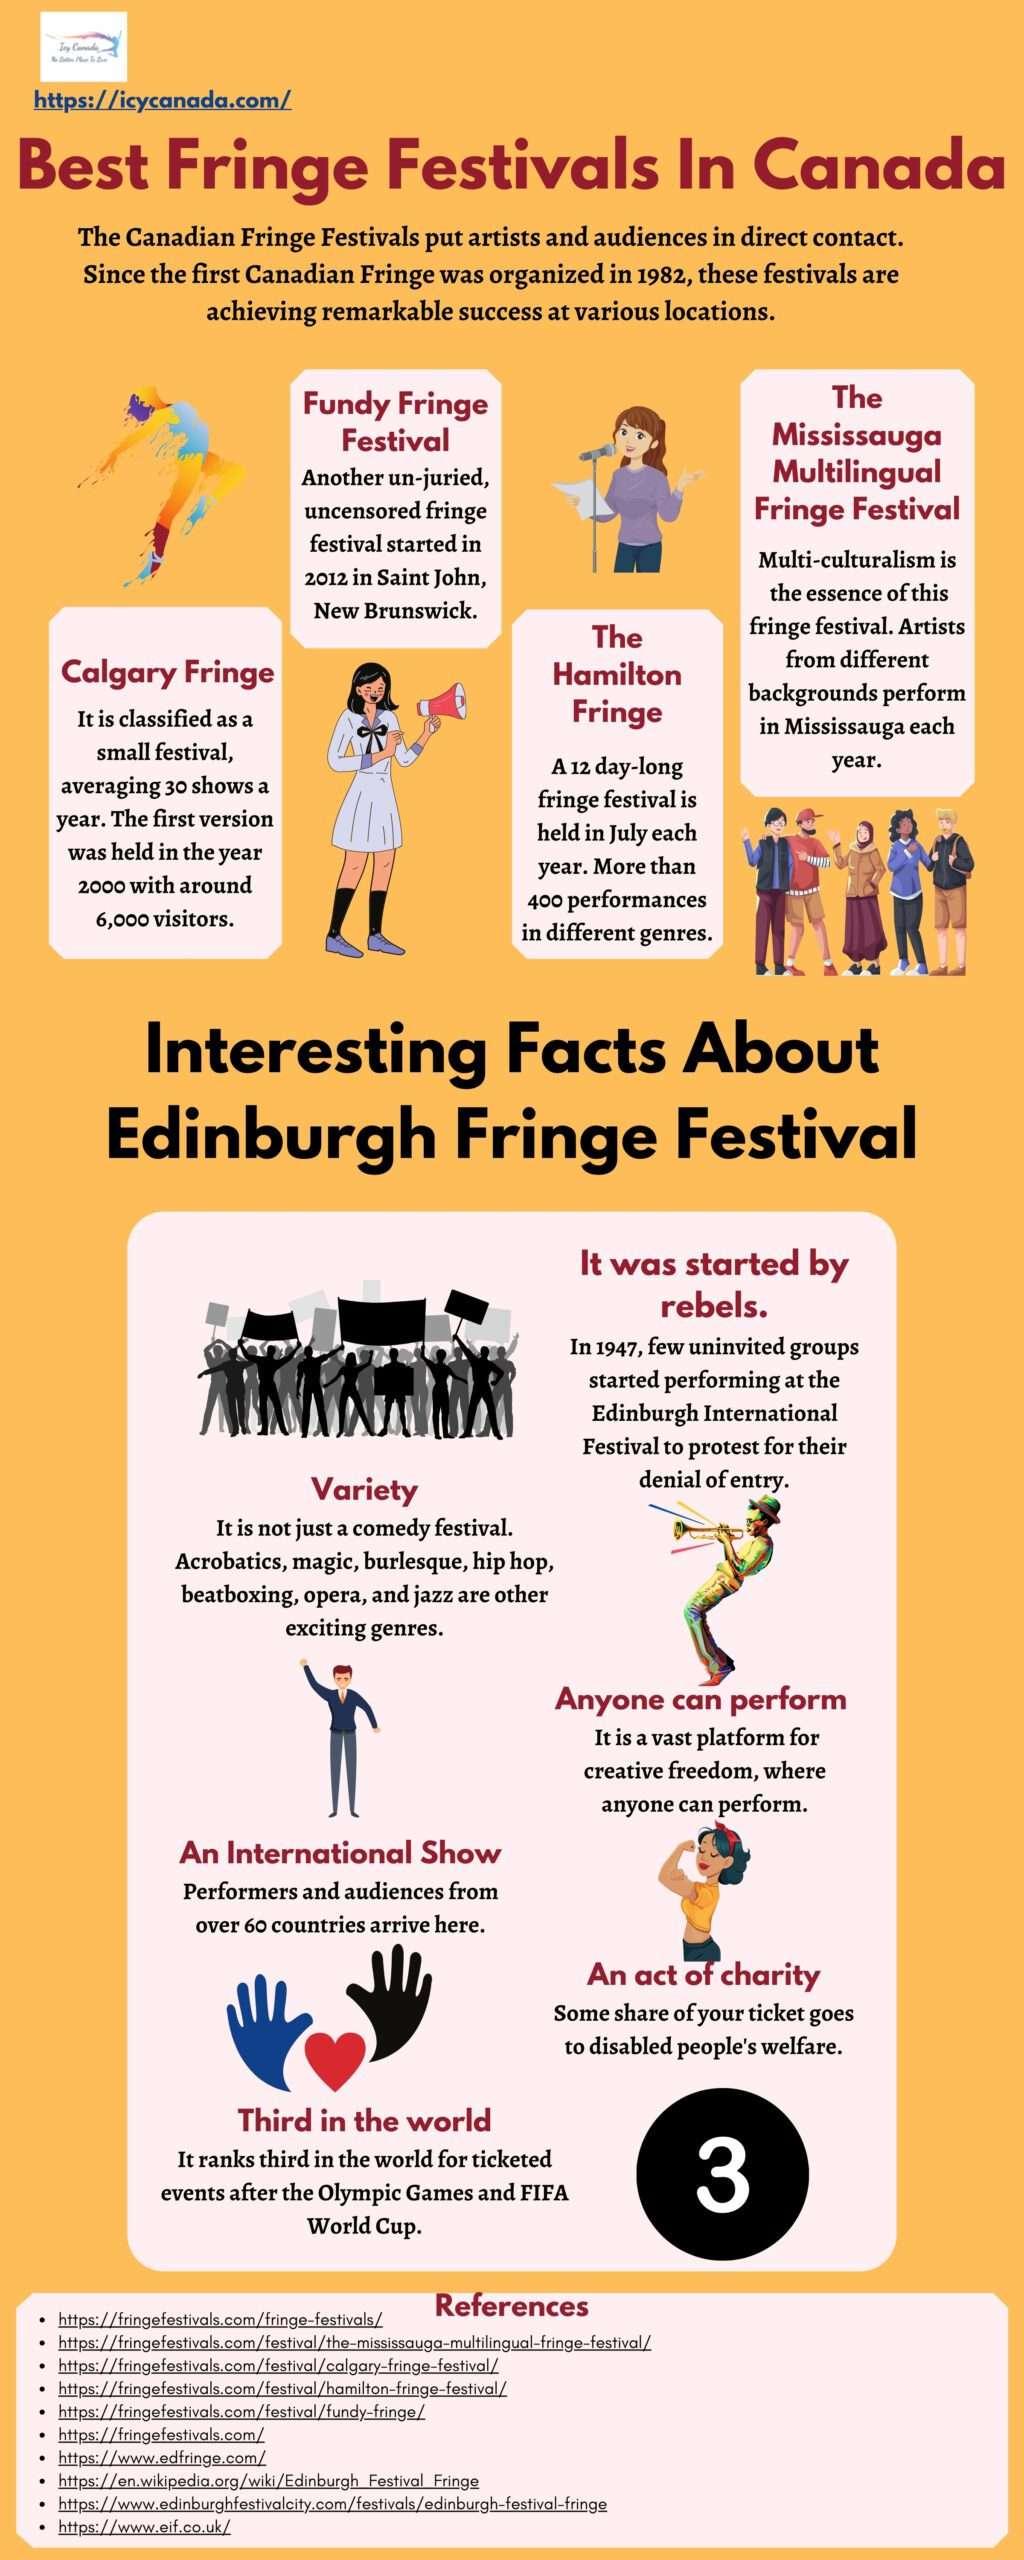 Best Fringe Festivals In Canada